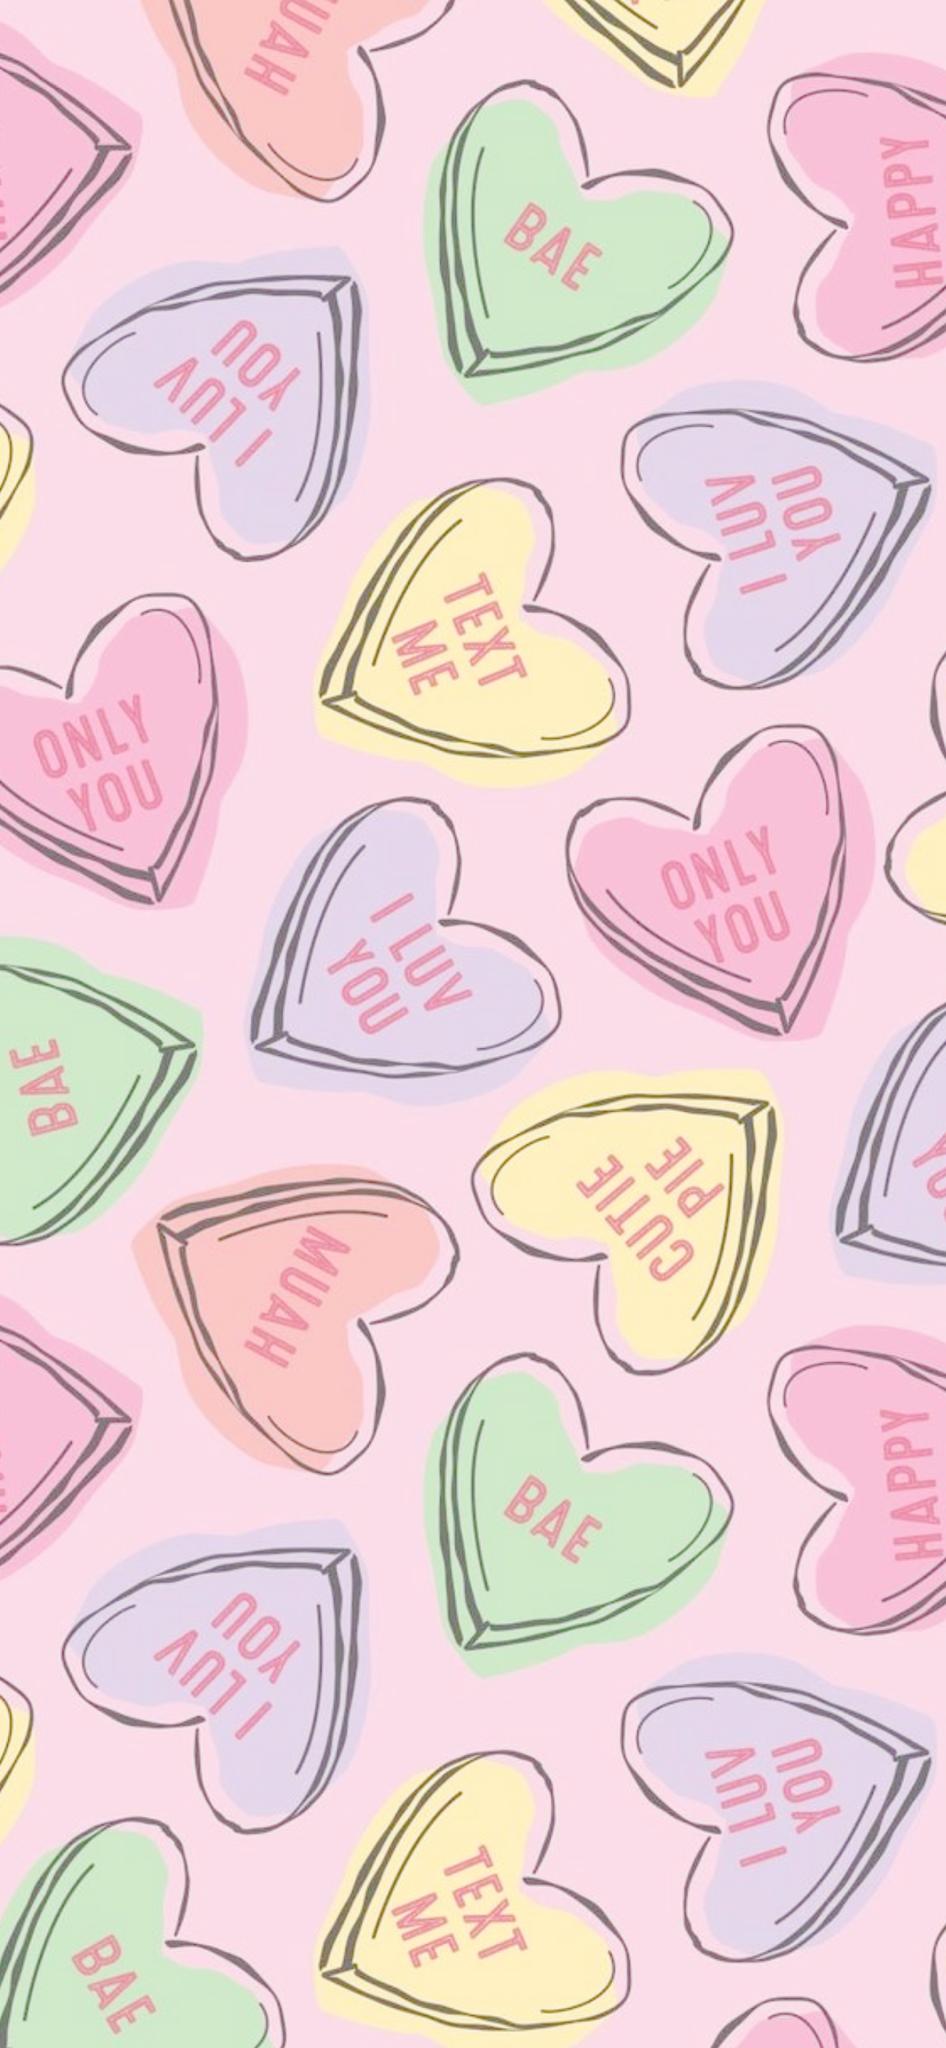 valentines wallpaper in 2020 valentines wallpaper